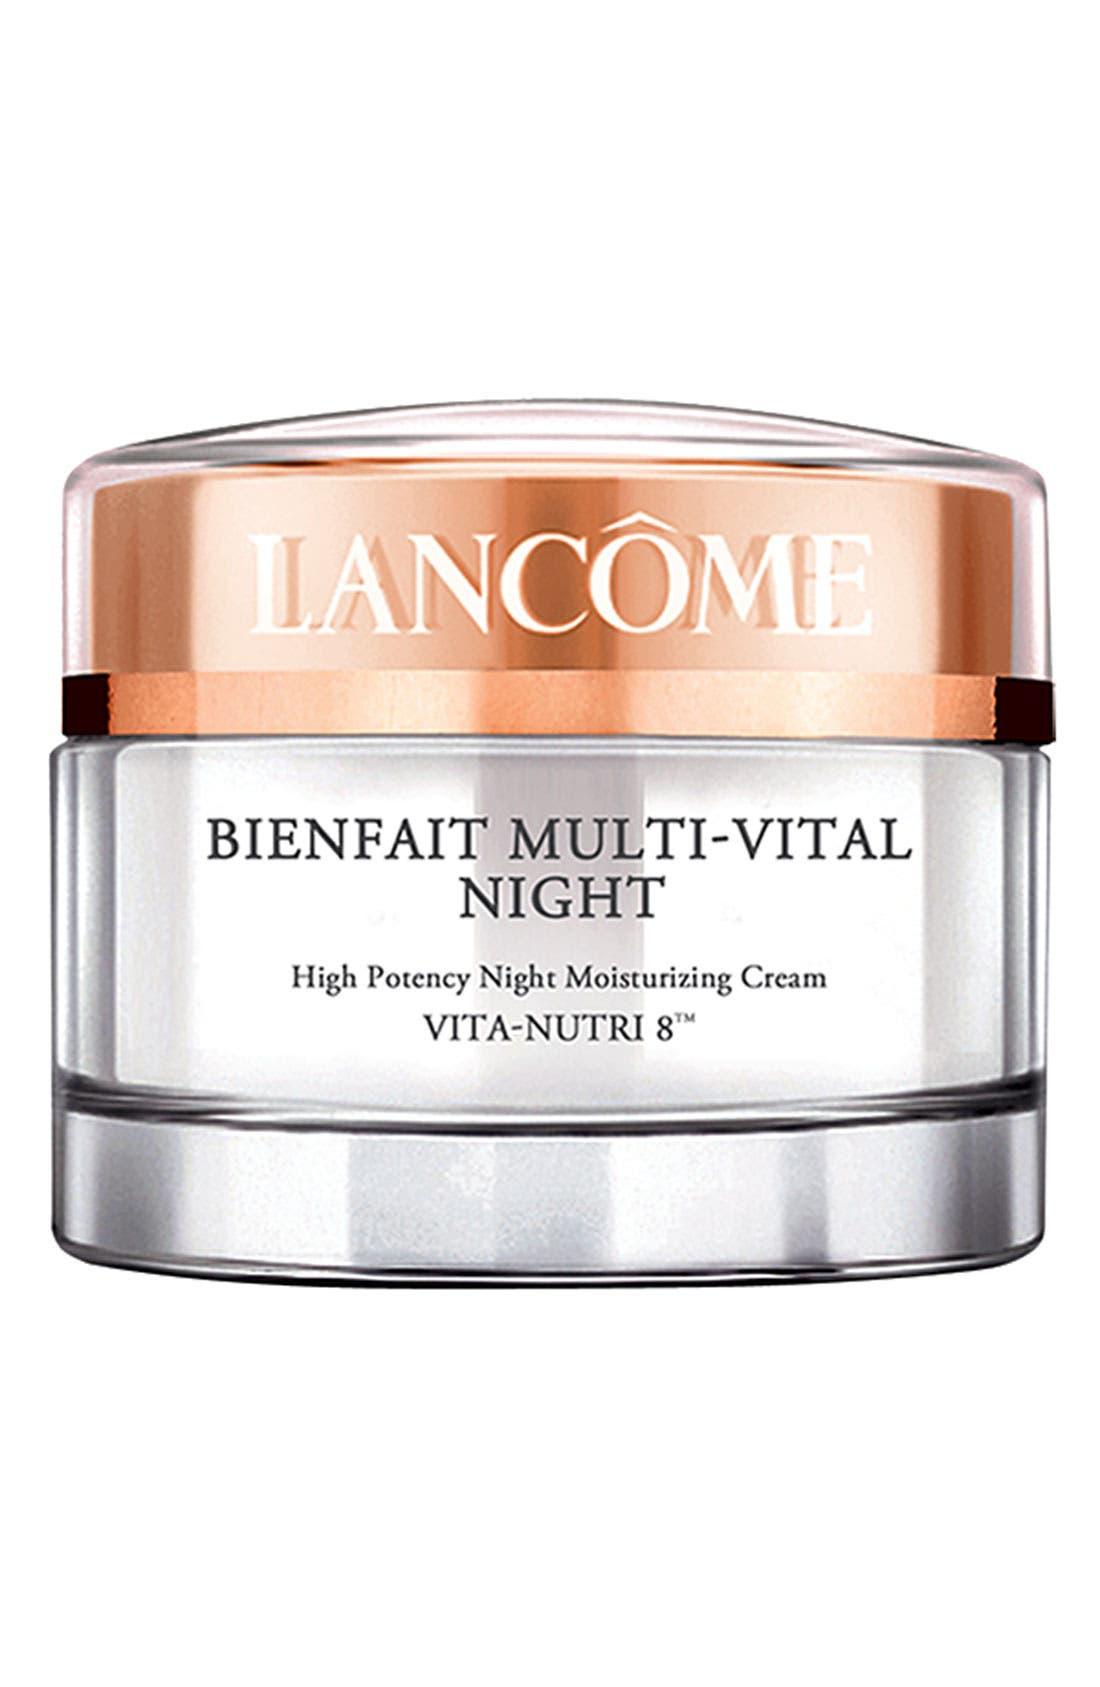 Bienfait Multi-Vital Night Cream,                             Main thumbnail 1, color,                             NO COLOR